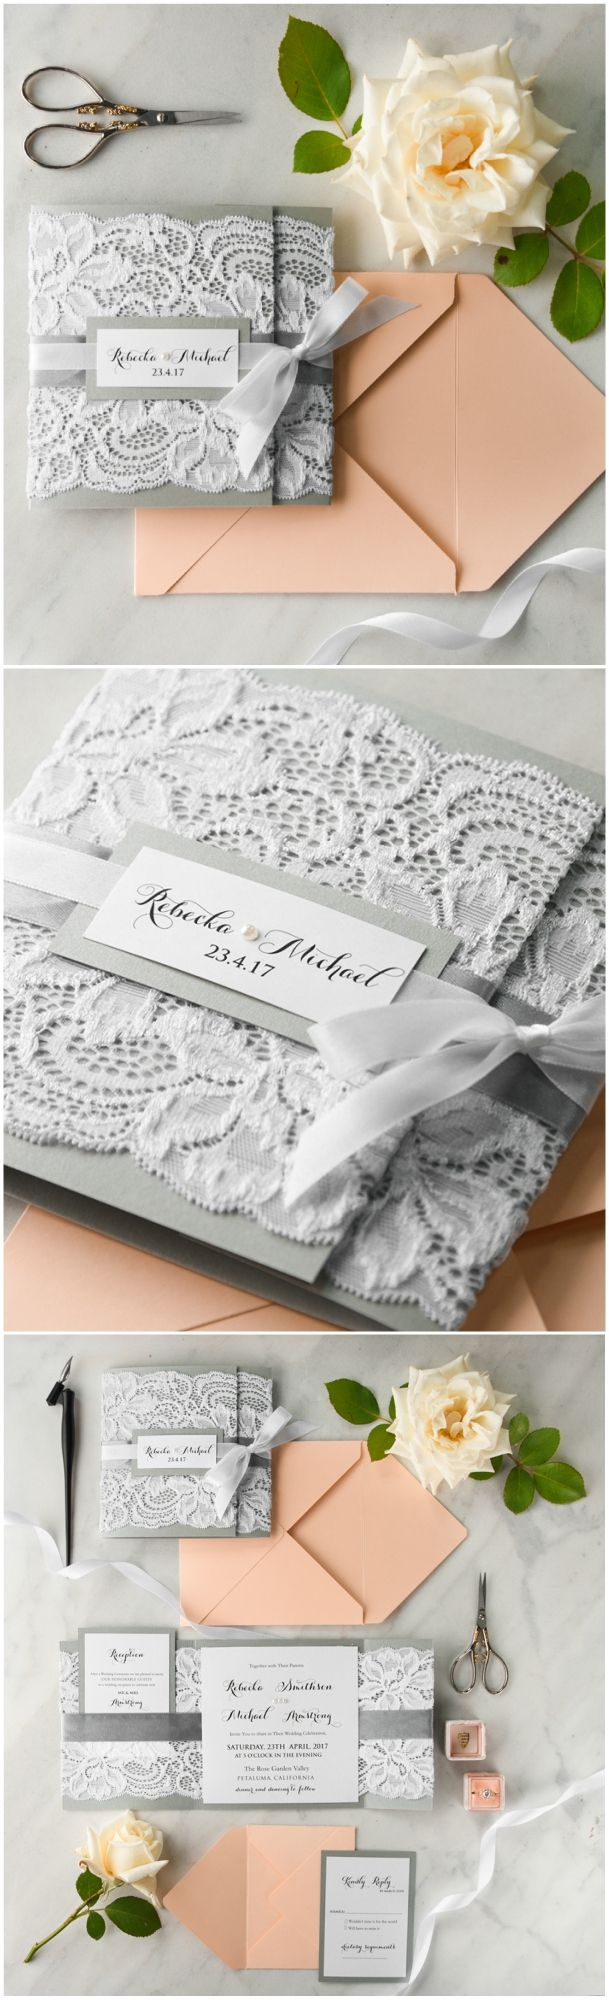 Peach & Grey Lace Wedding Invitations #romantic #lace #peach #grey #vintage #elegant #weddingideas #weddinginvitations